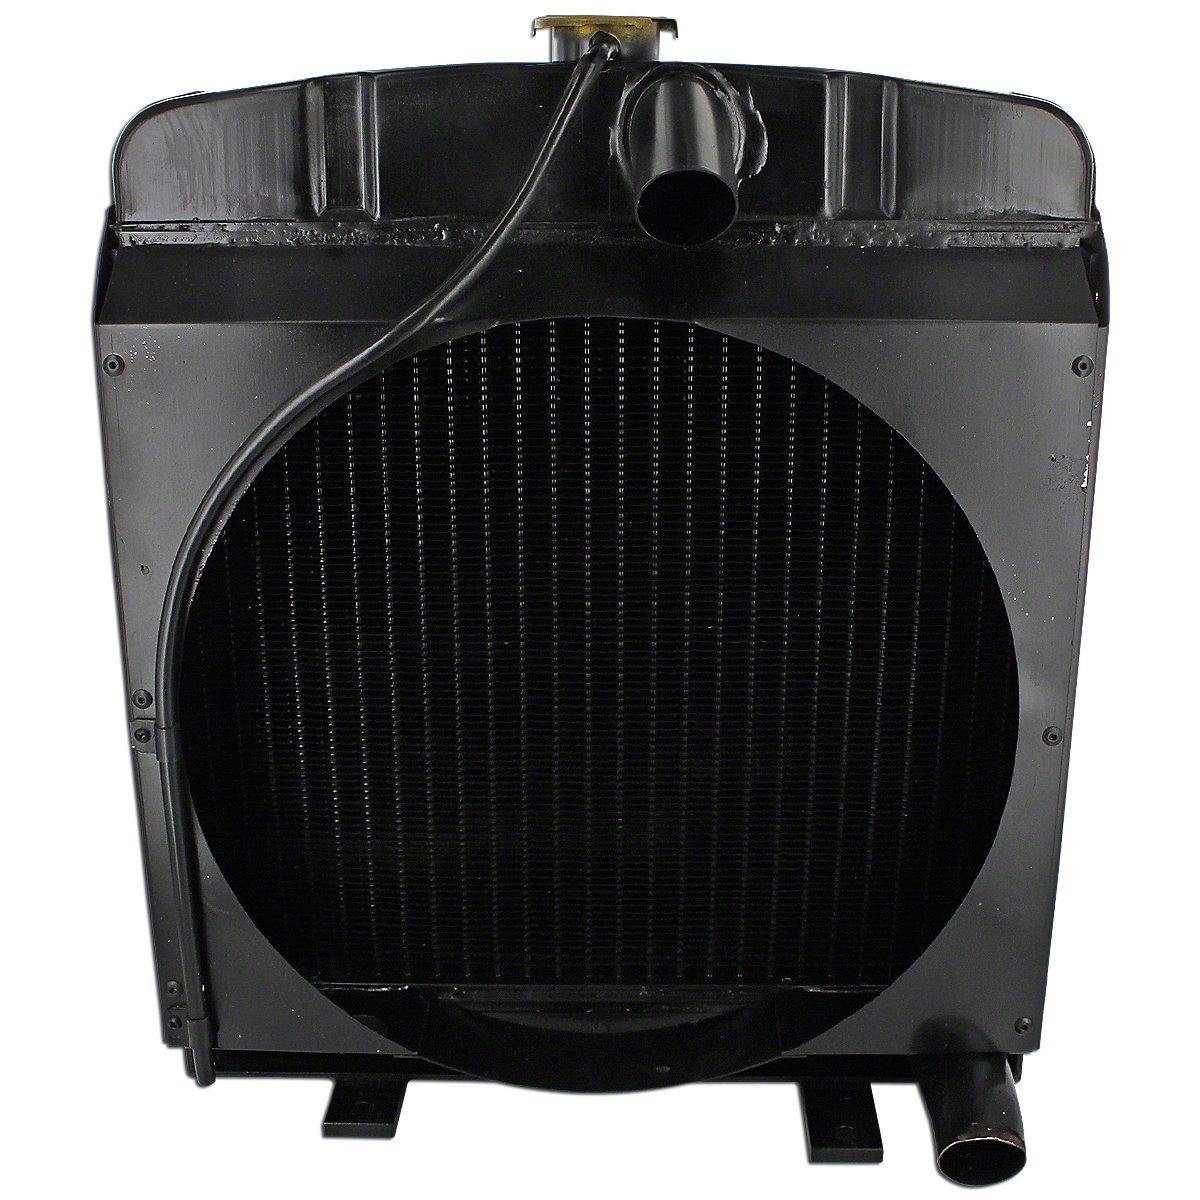 Radiator For Allis Chalmers: G